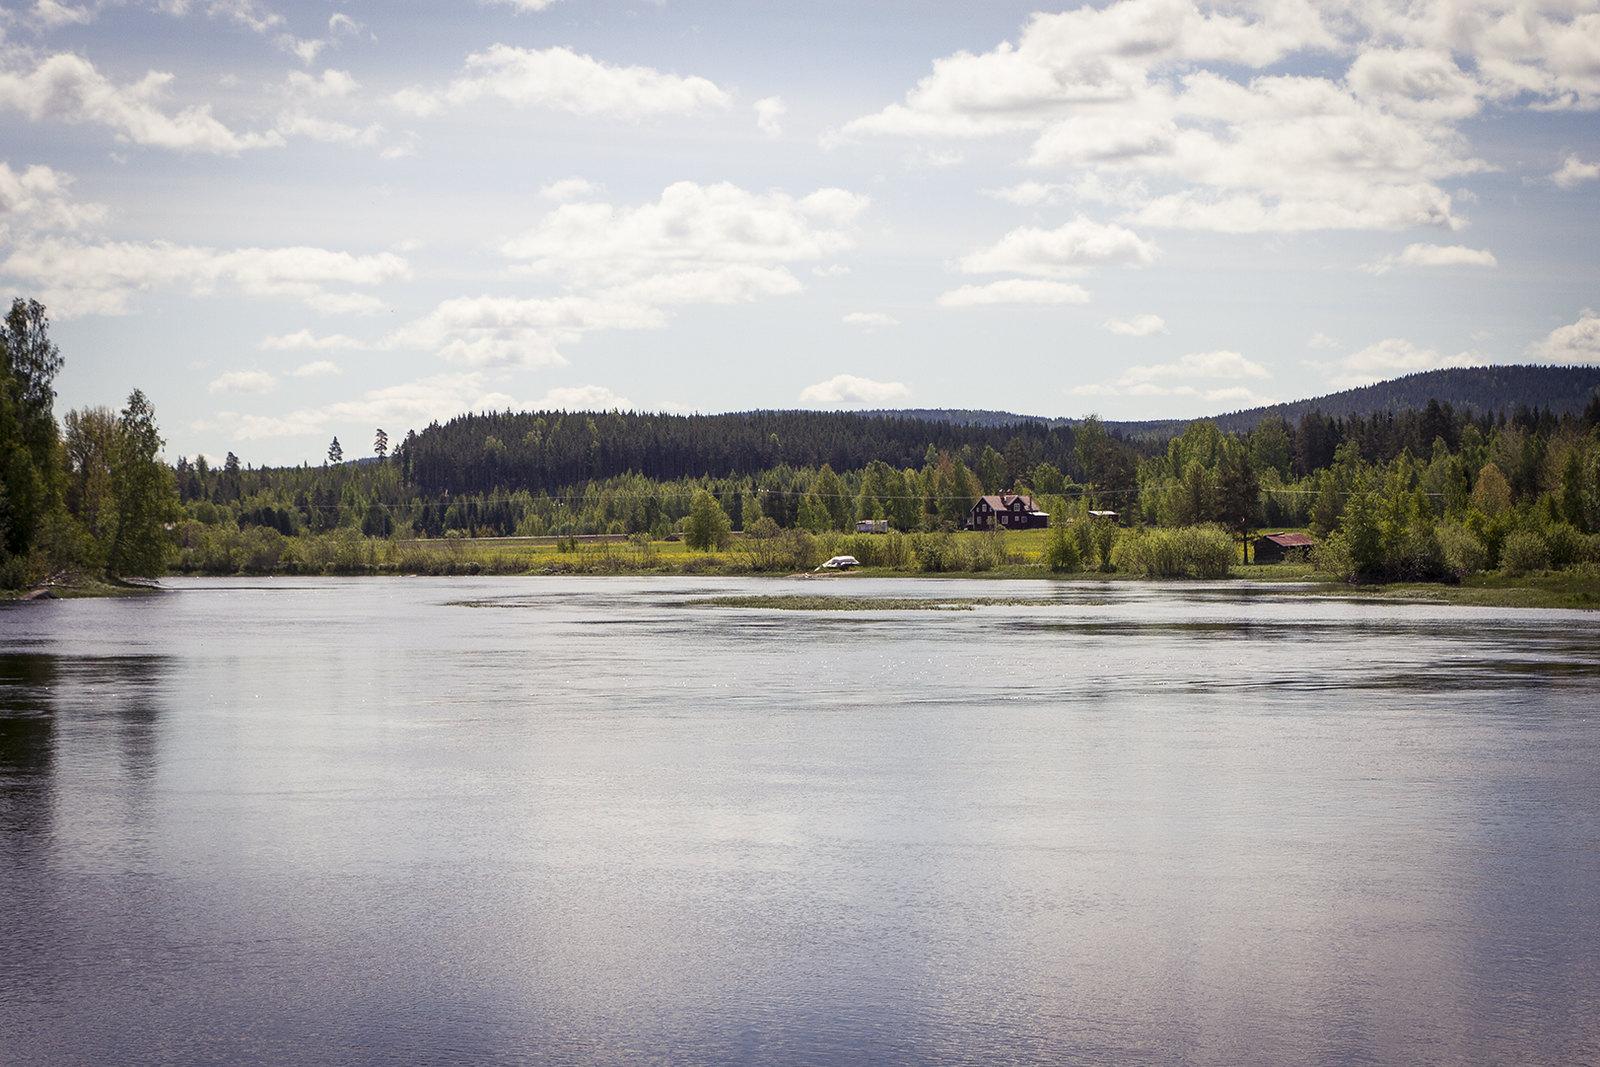 Sommar i Hälsingland www.traningsgladje.se